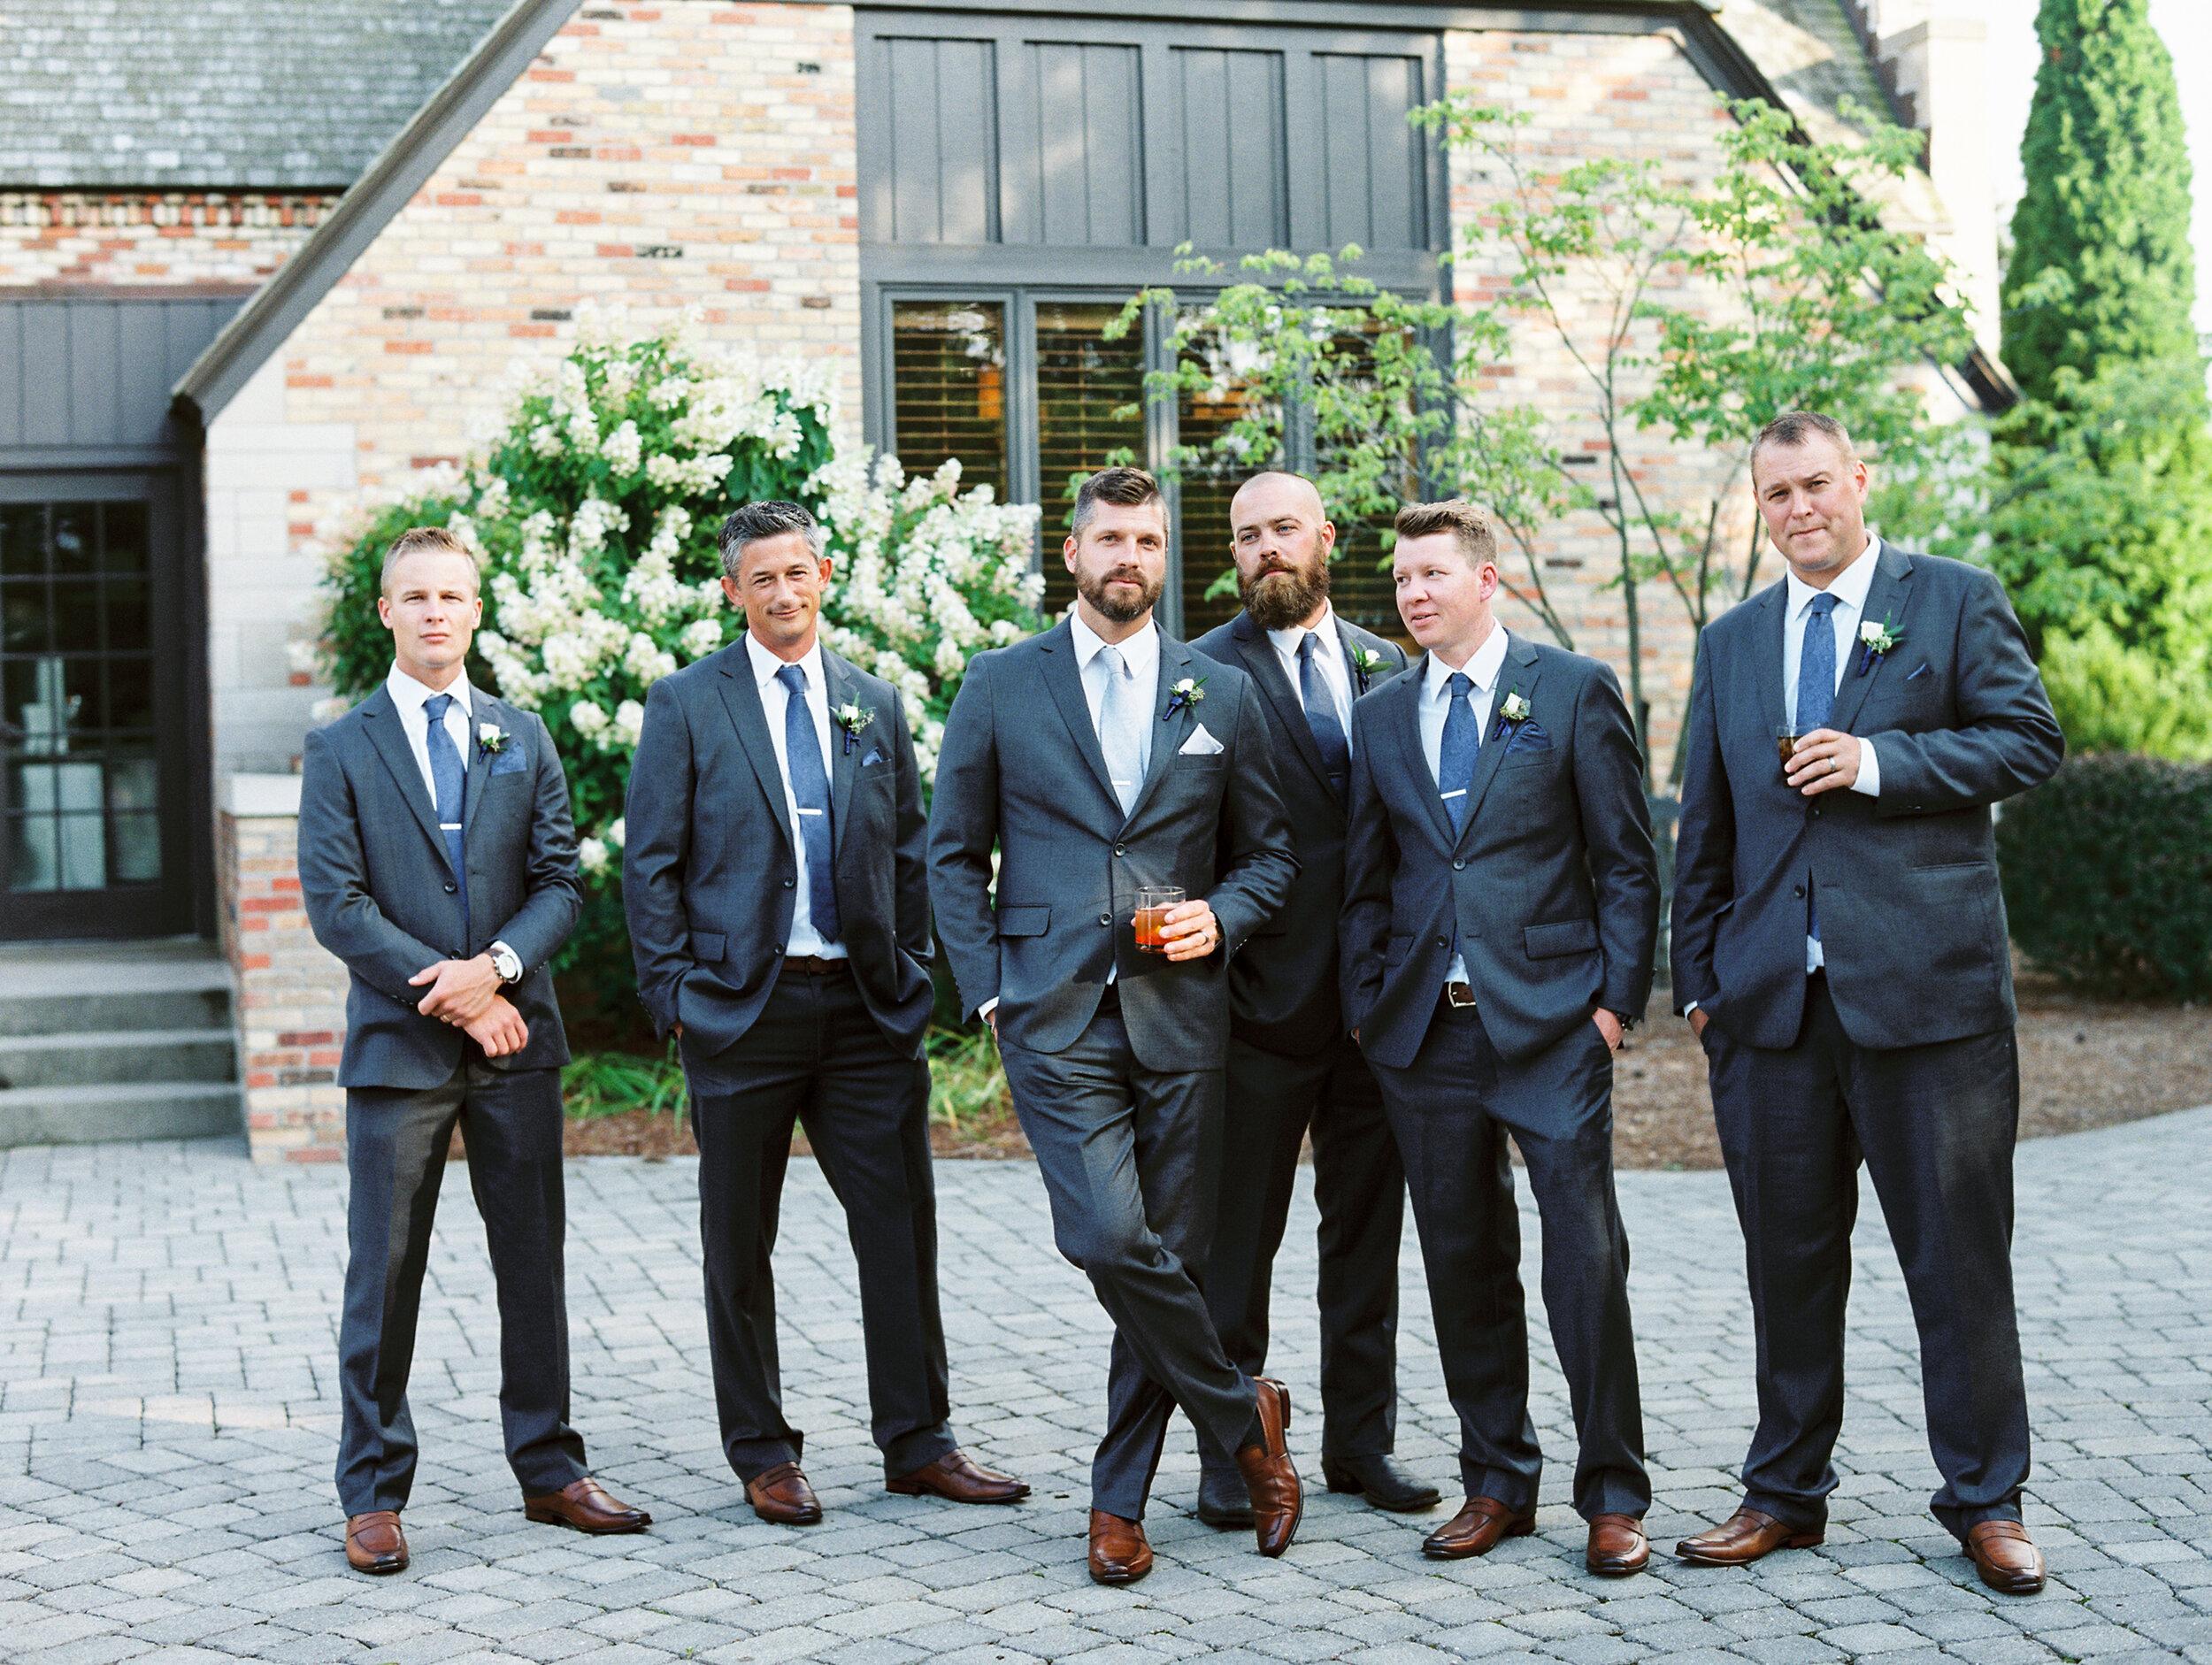 Kuiper+Wedding+Reception+Bridal+Party-119.jpg